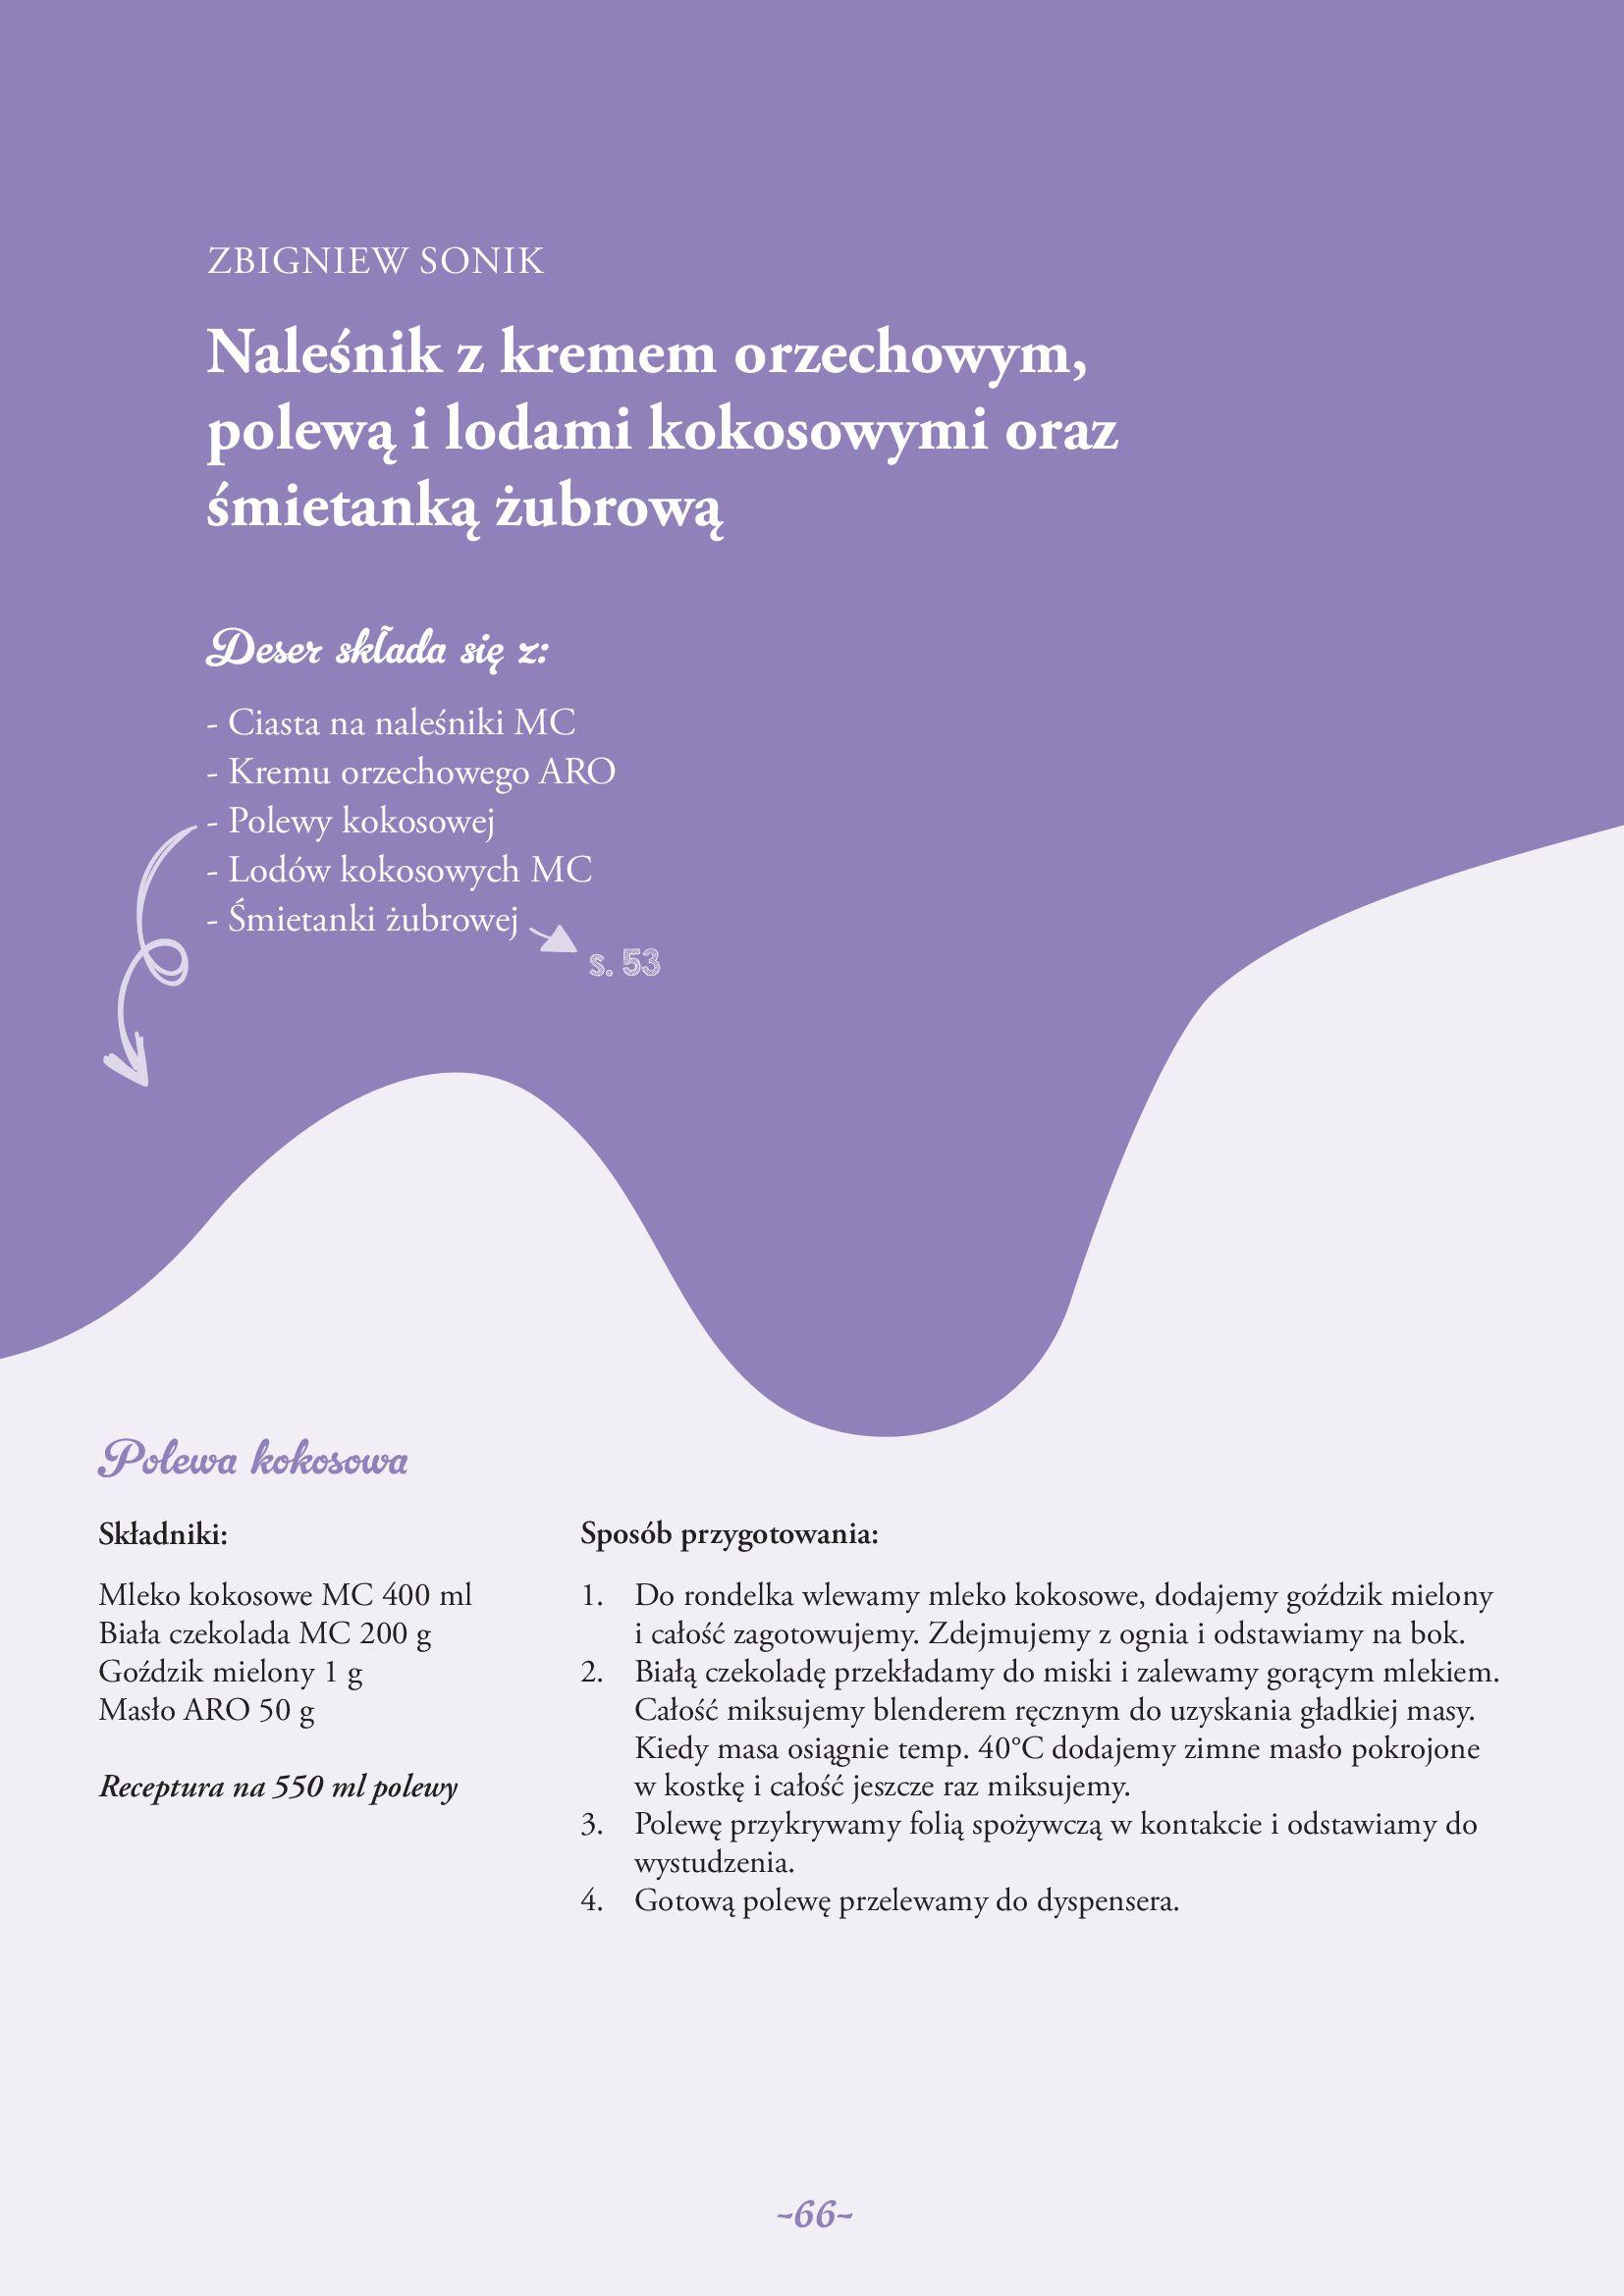 Gazetka Makro: Gazetka Makro - lody i desery 2021-05-21 page-66